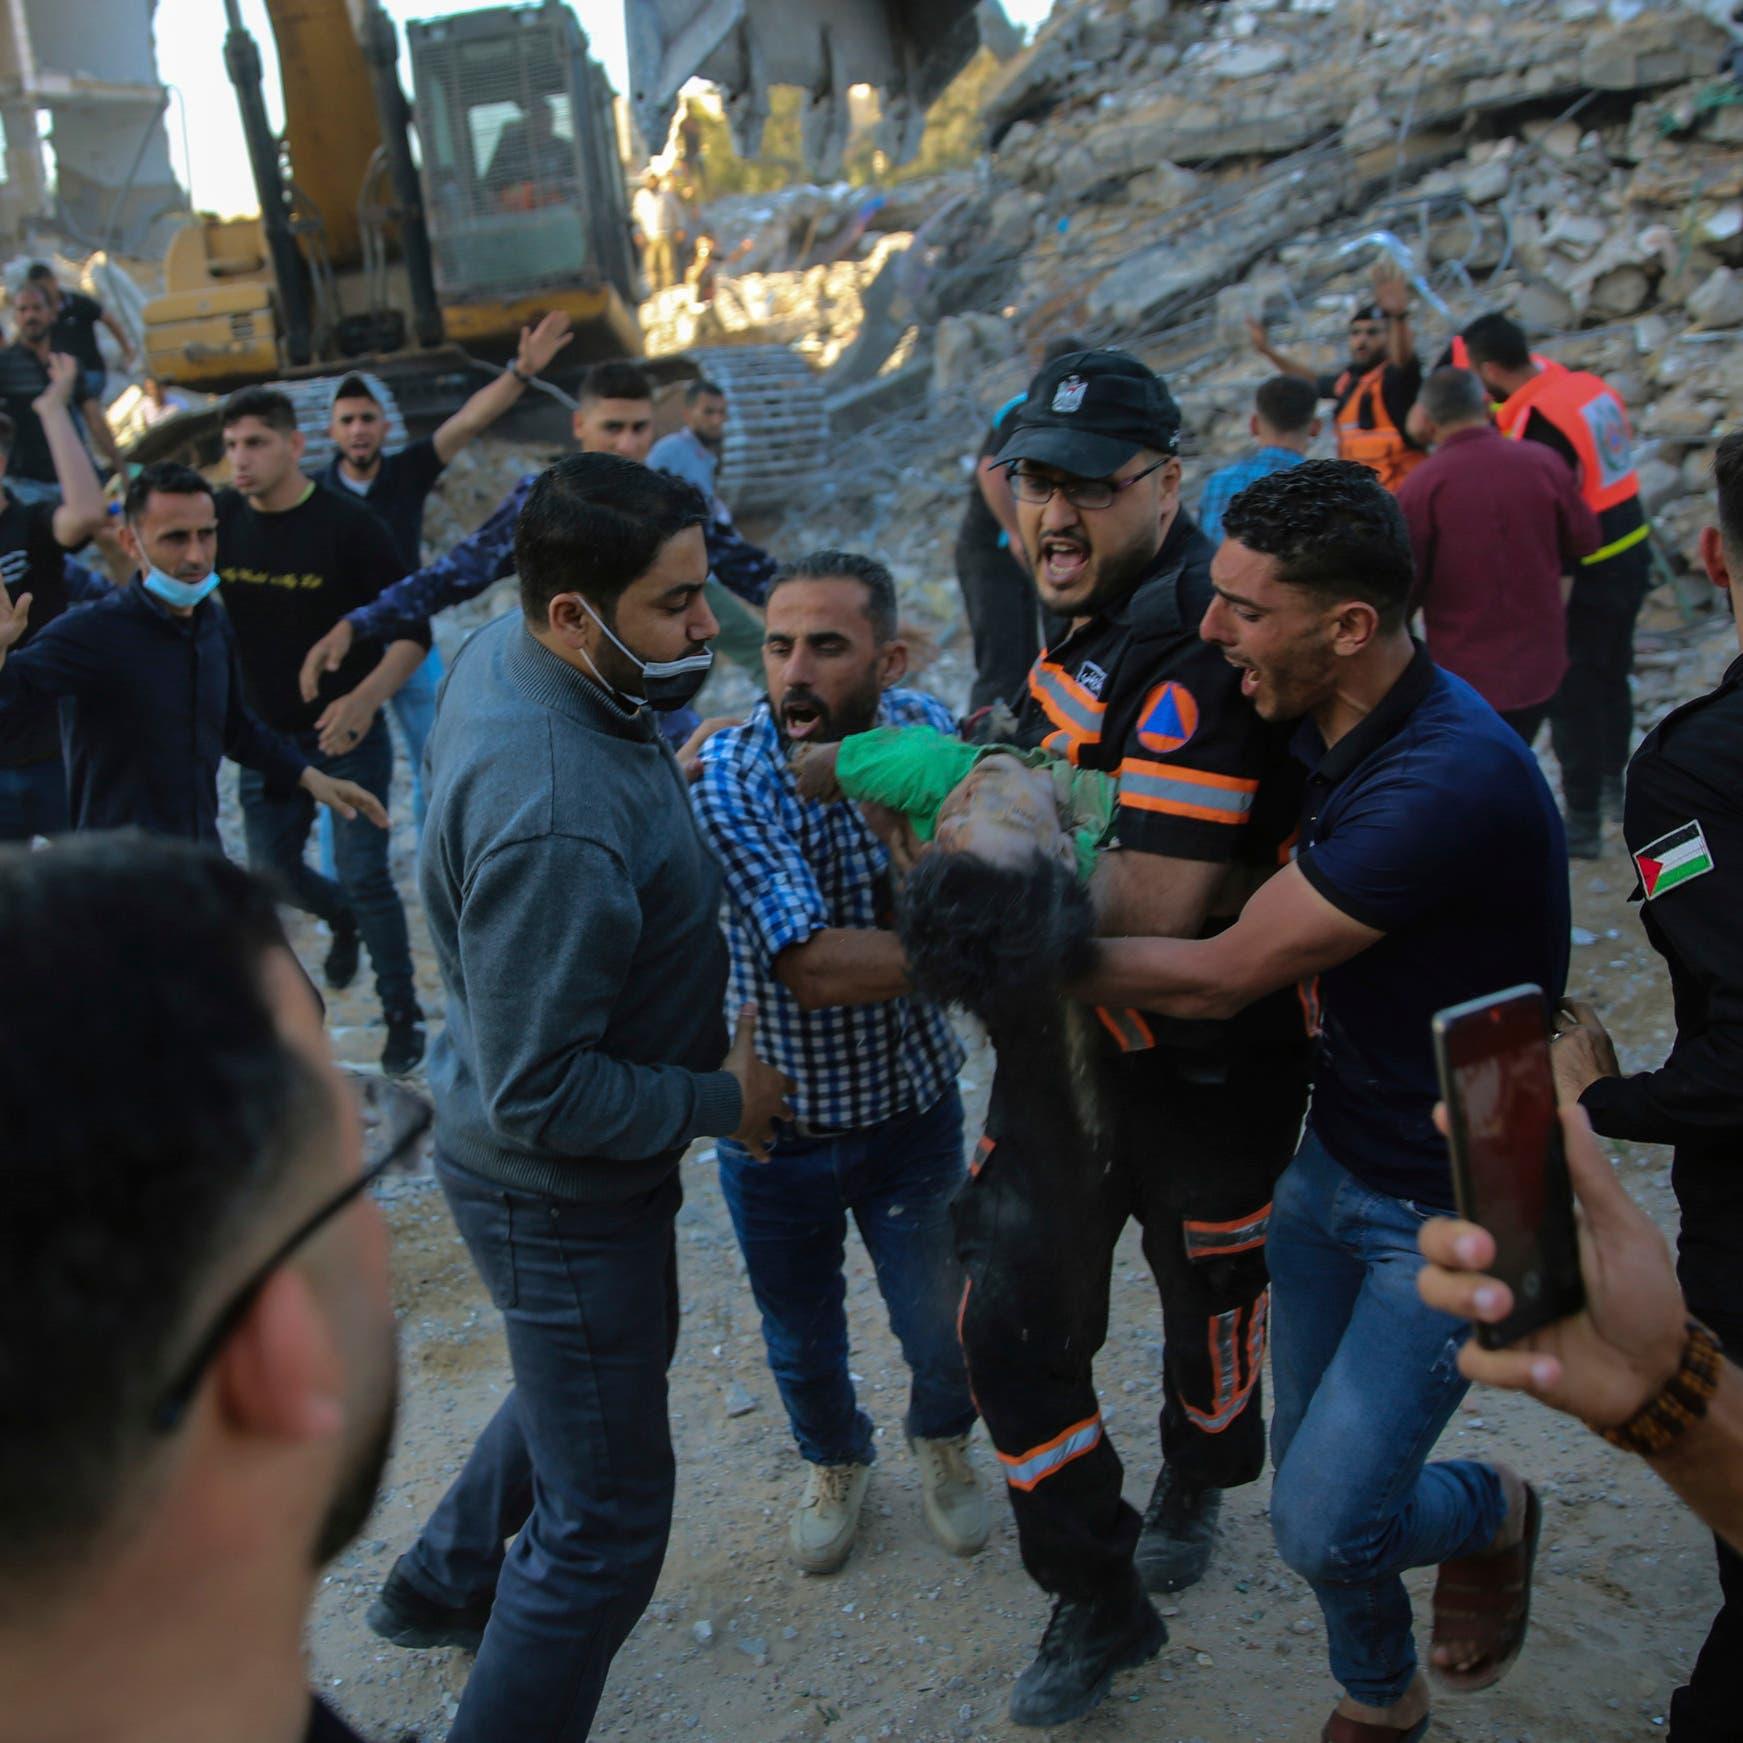 Gaza hospitals already struggling with COVID-19 now treating injured